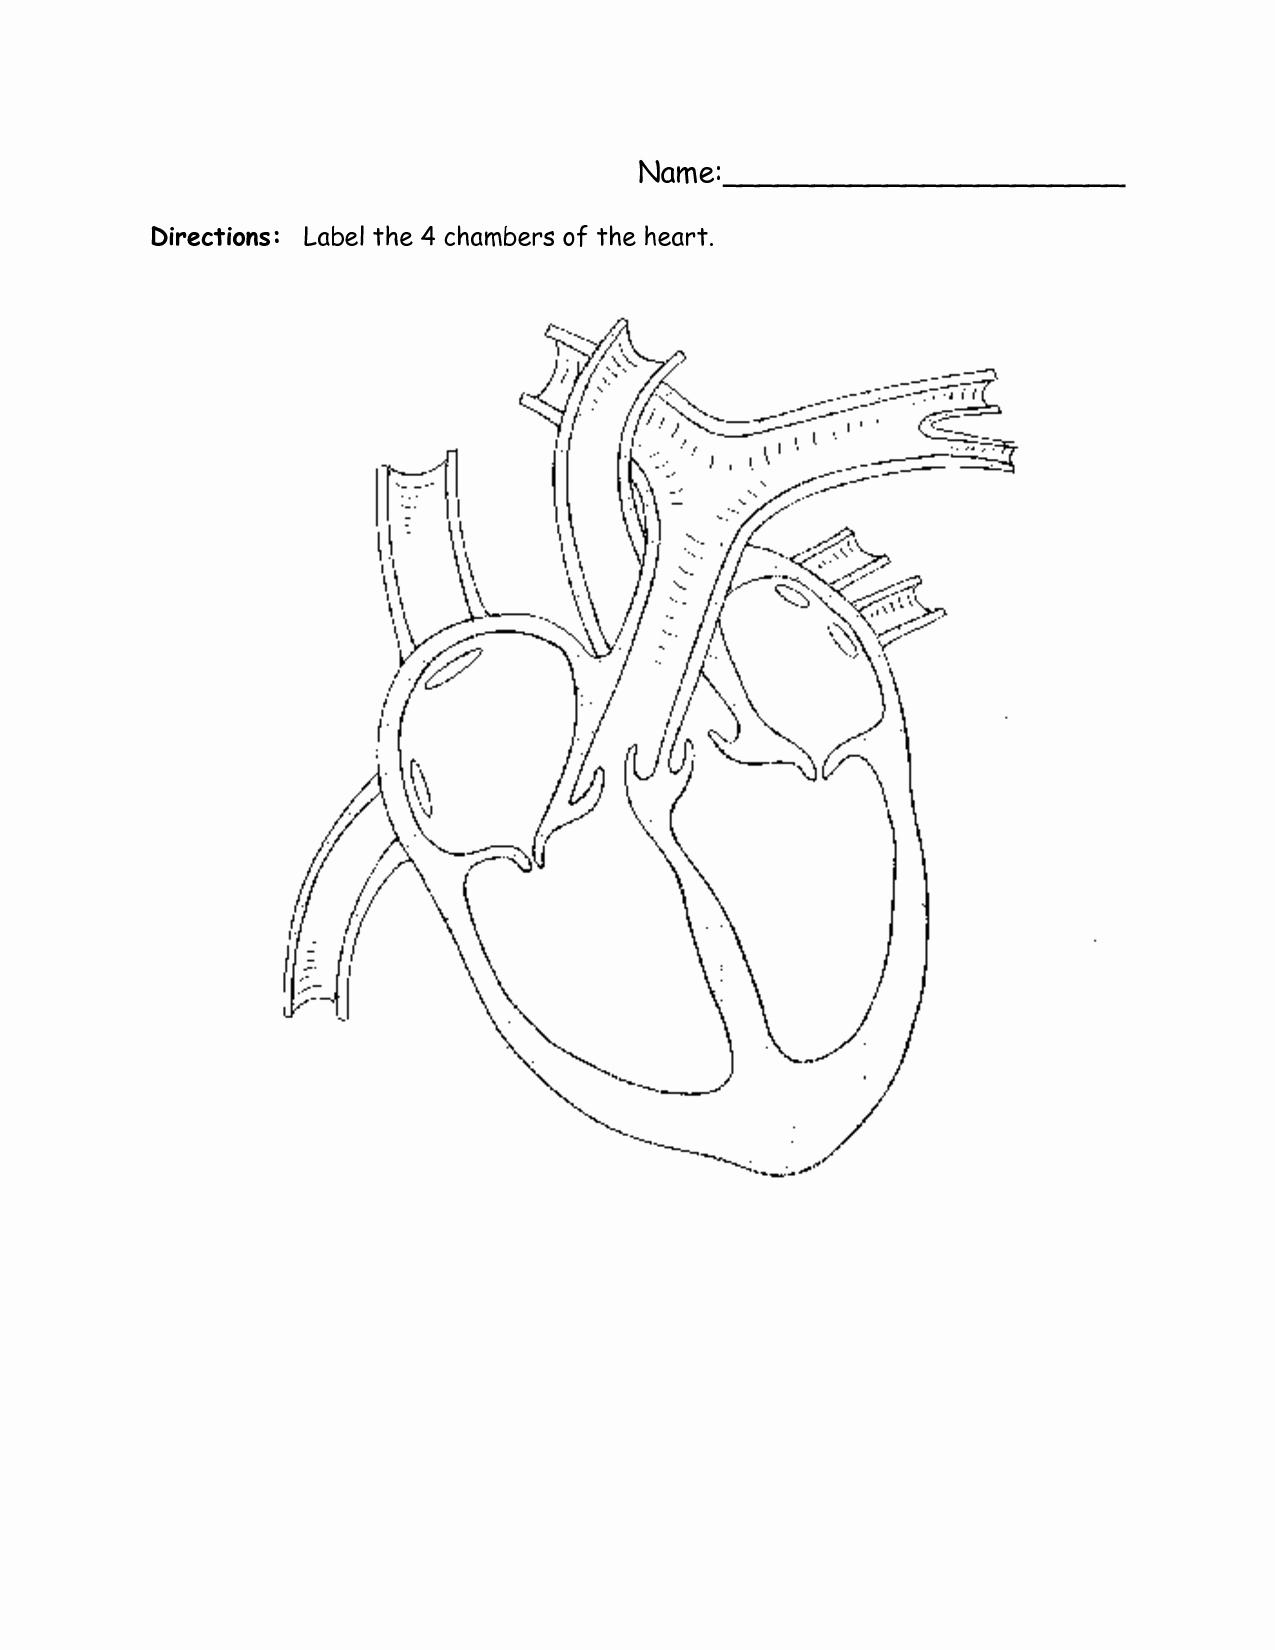 Heart Diagram Worksheet Blank Beautiful Simple Heart Diagram for Kids to Label Diagram